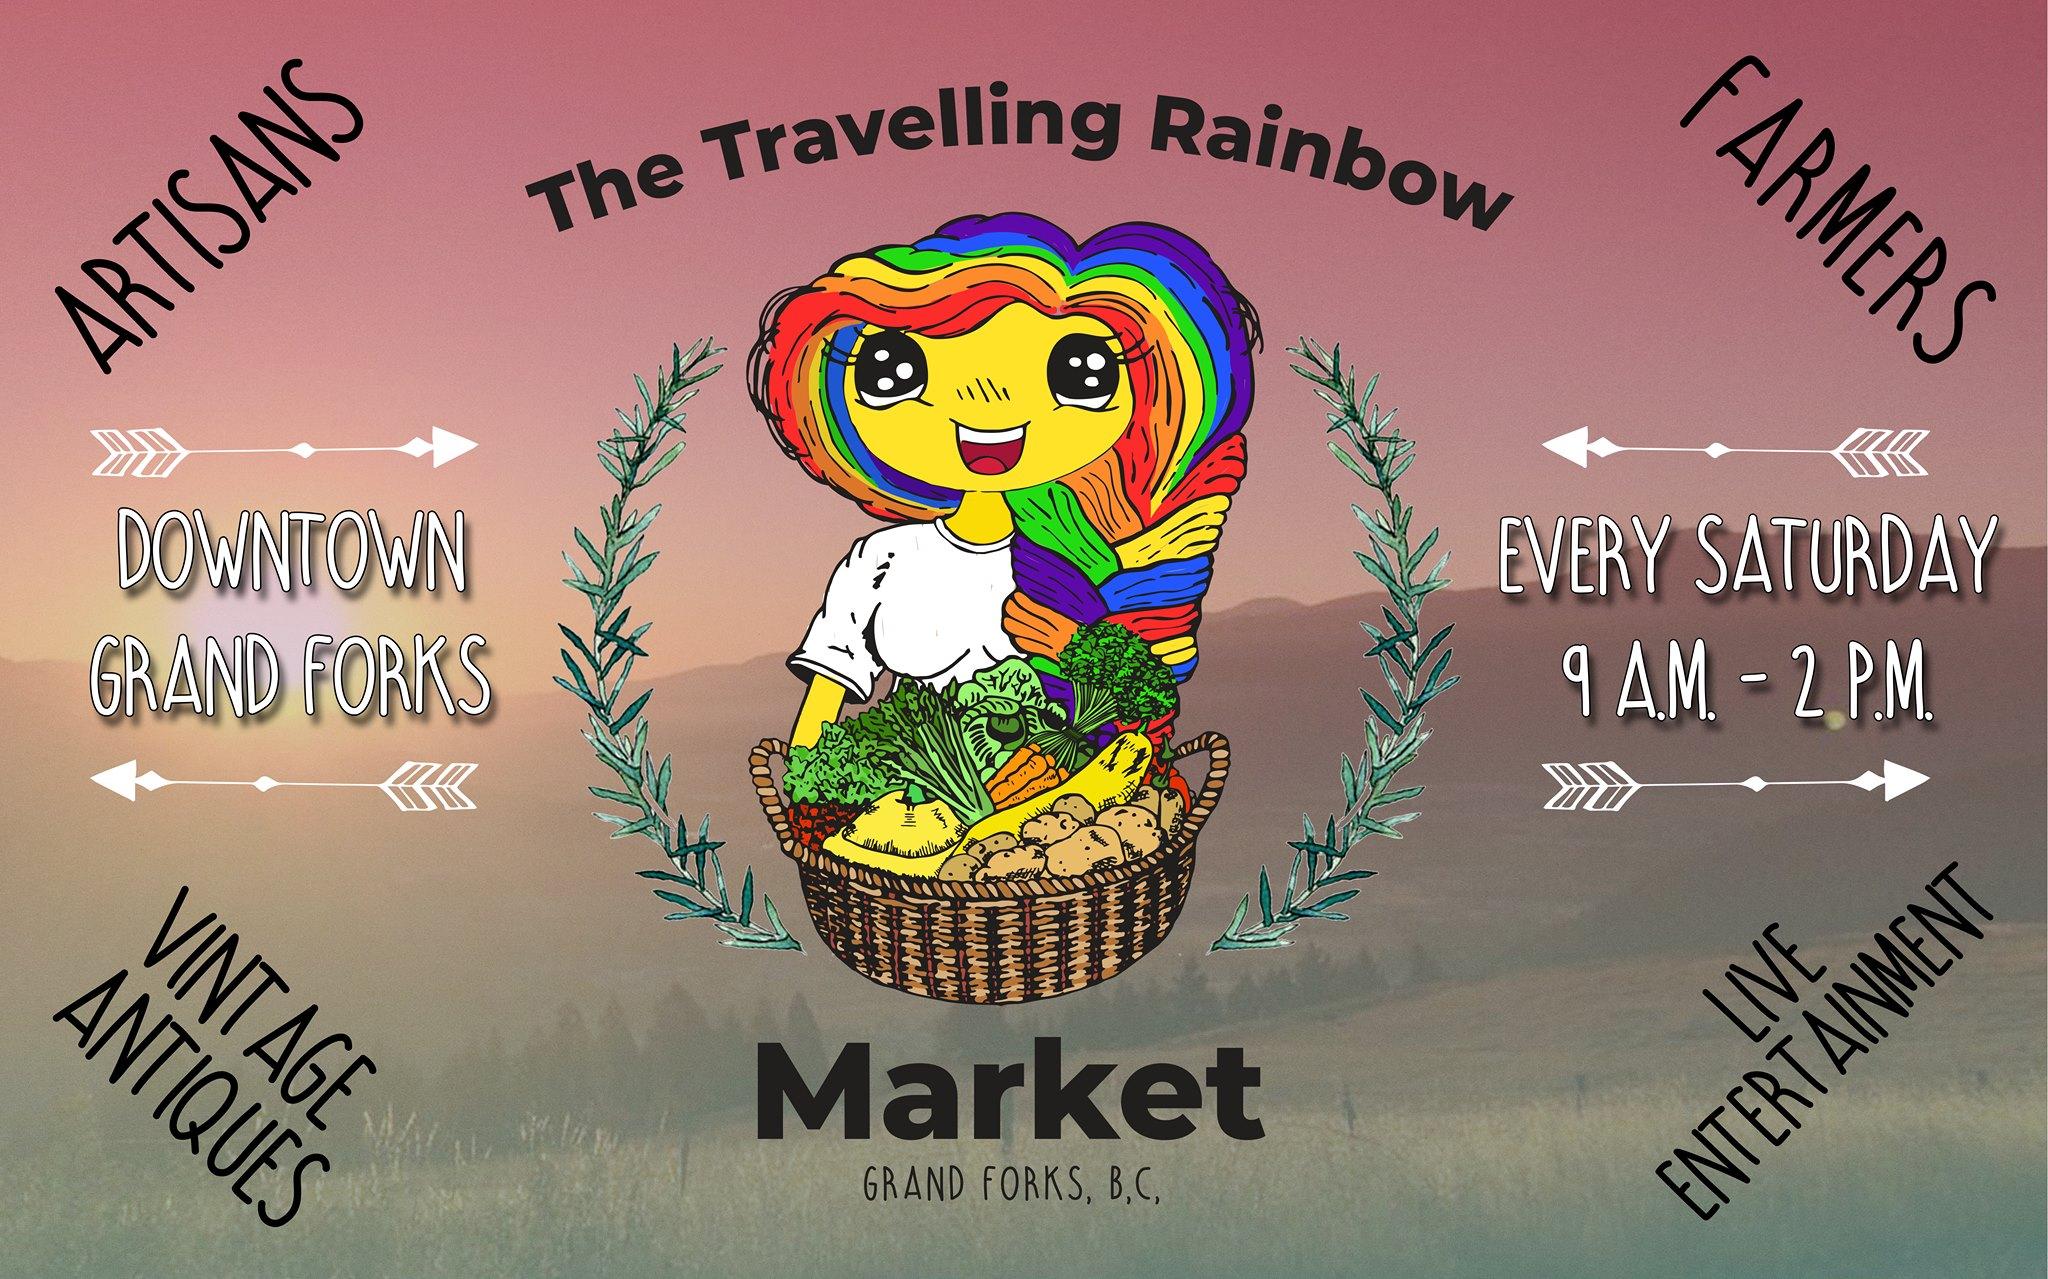 2018 Travelling Rainbow Market